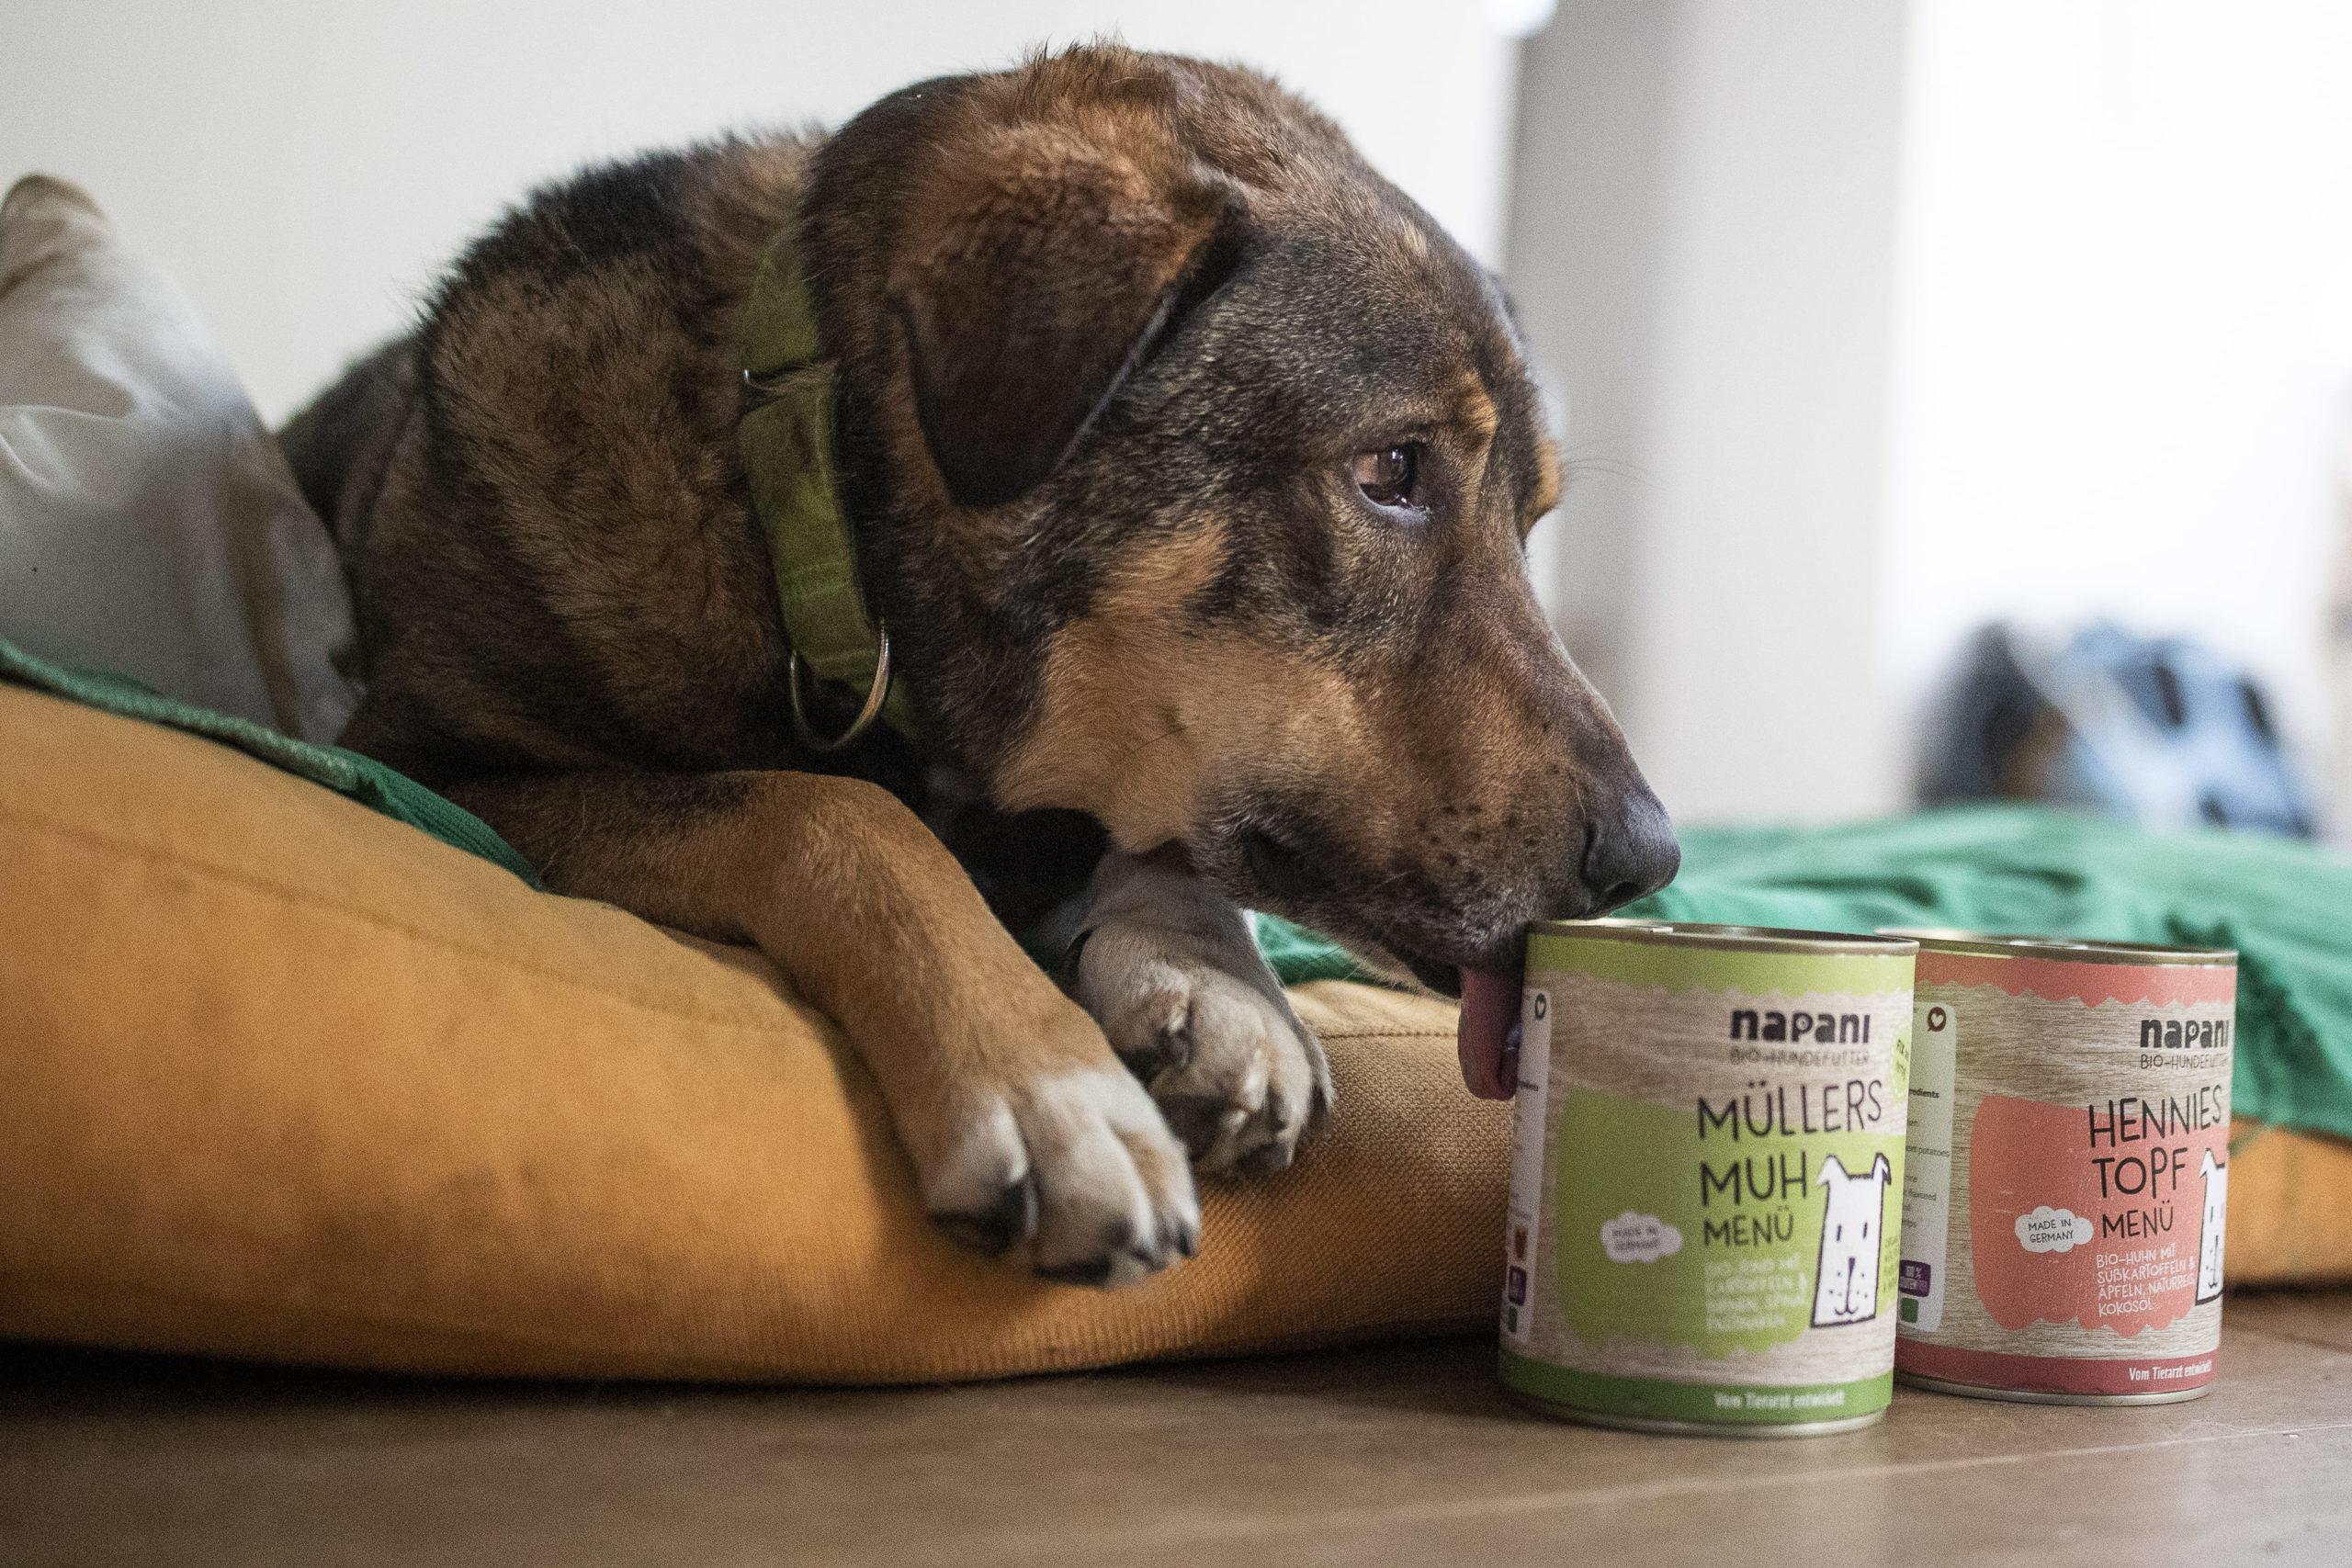 Napani Premiumhundefutter in BIO Qualität